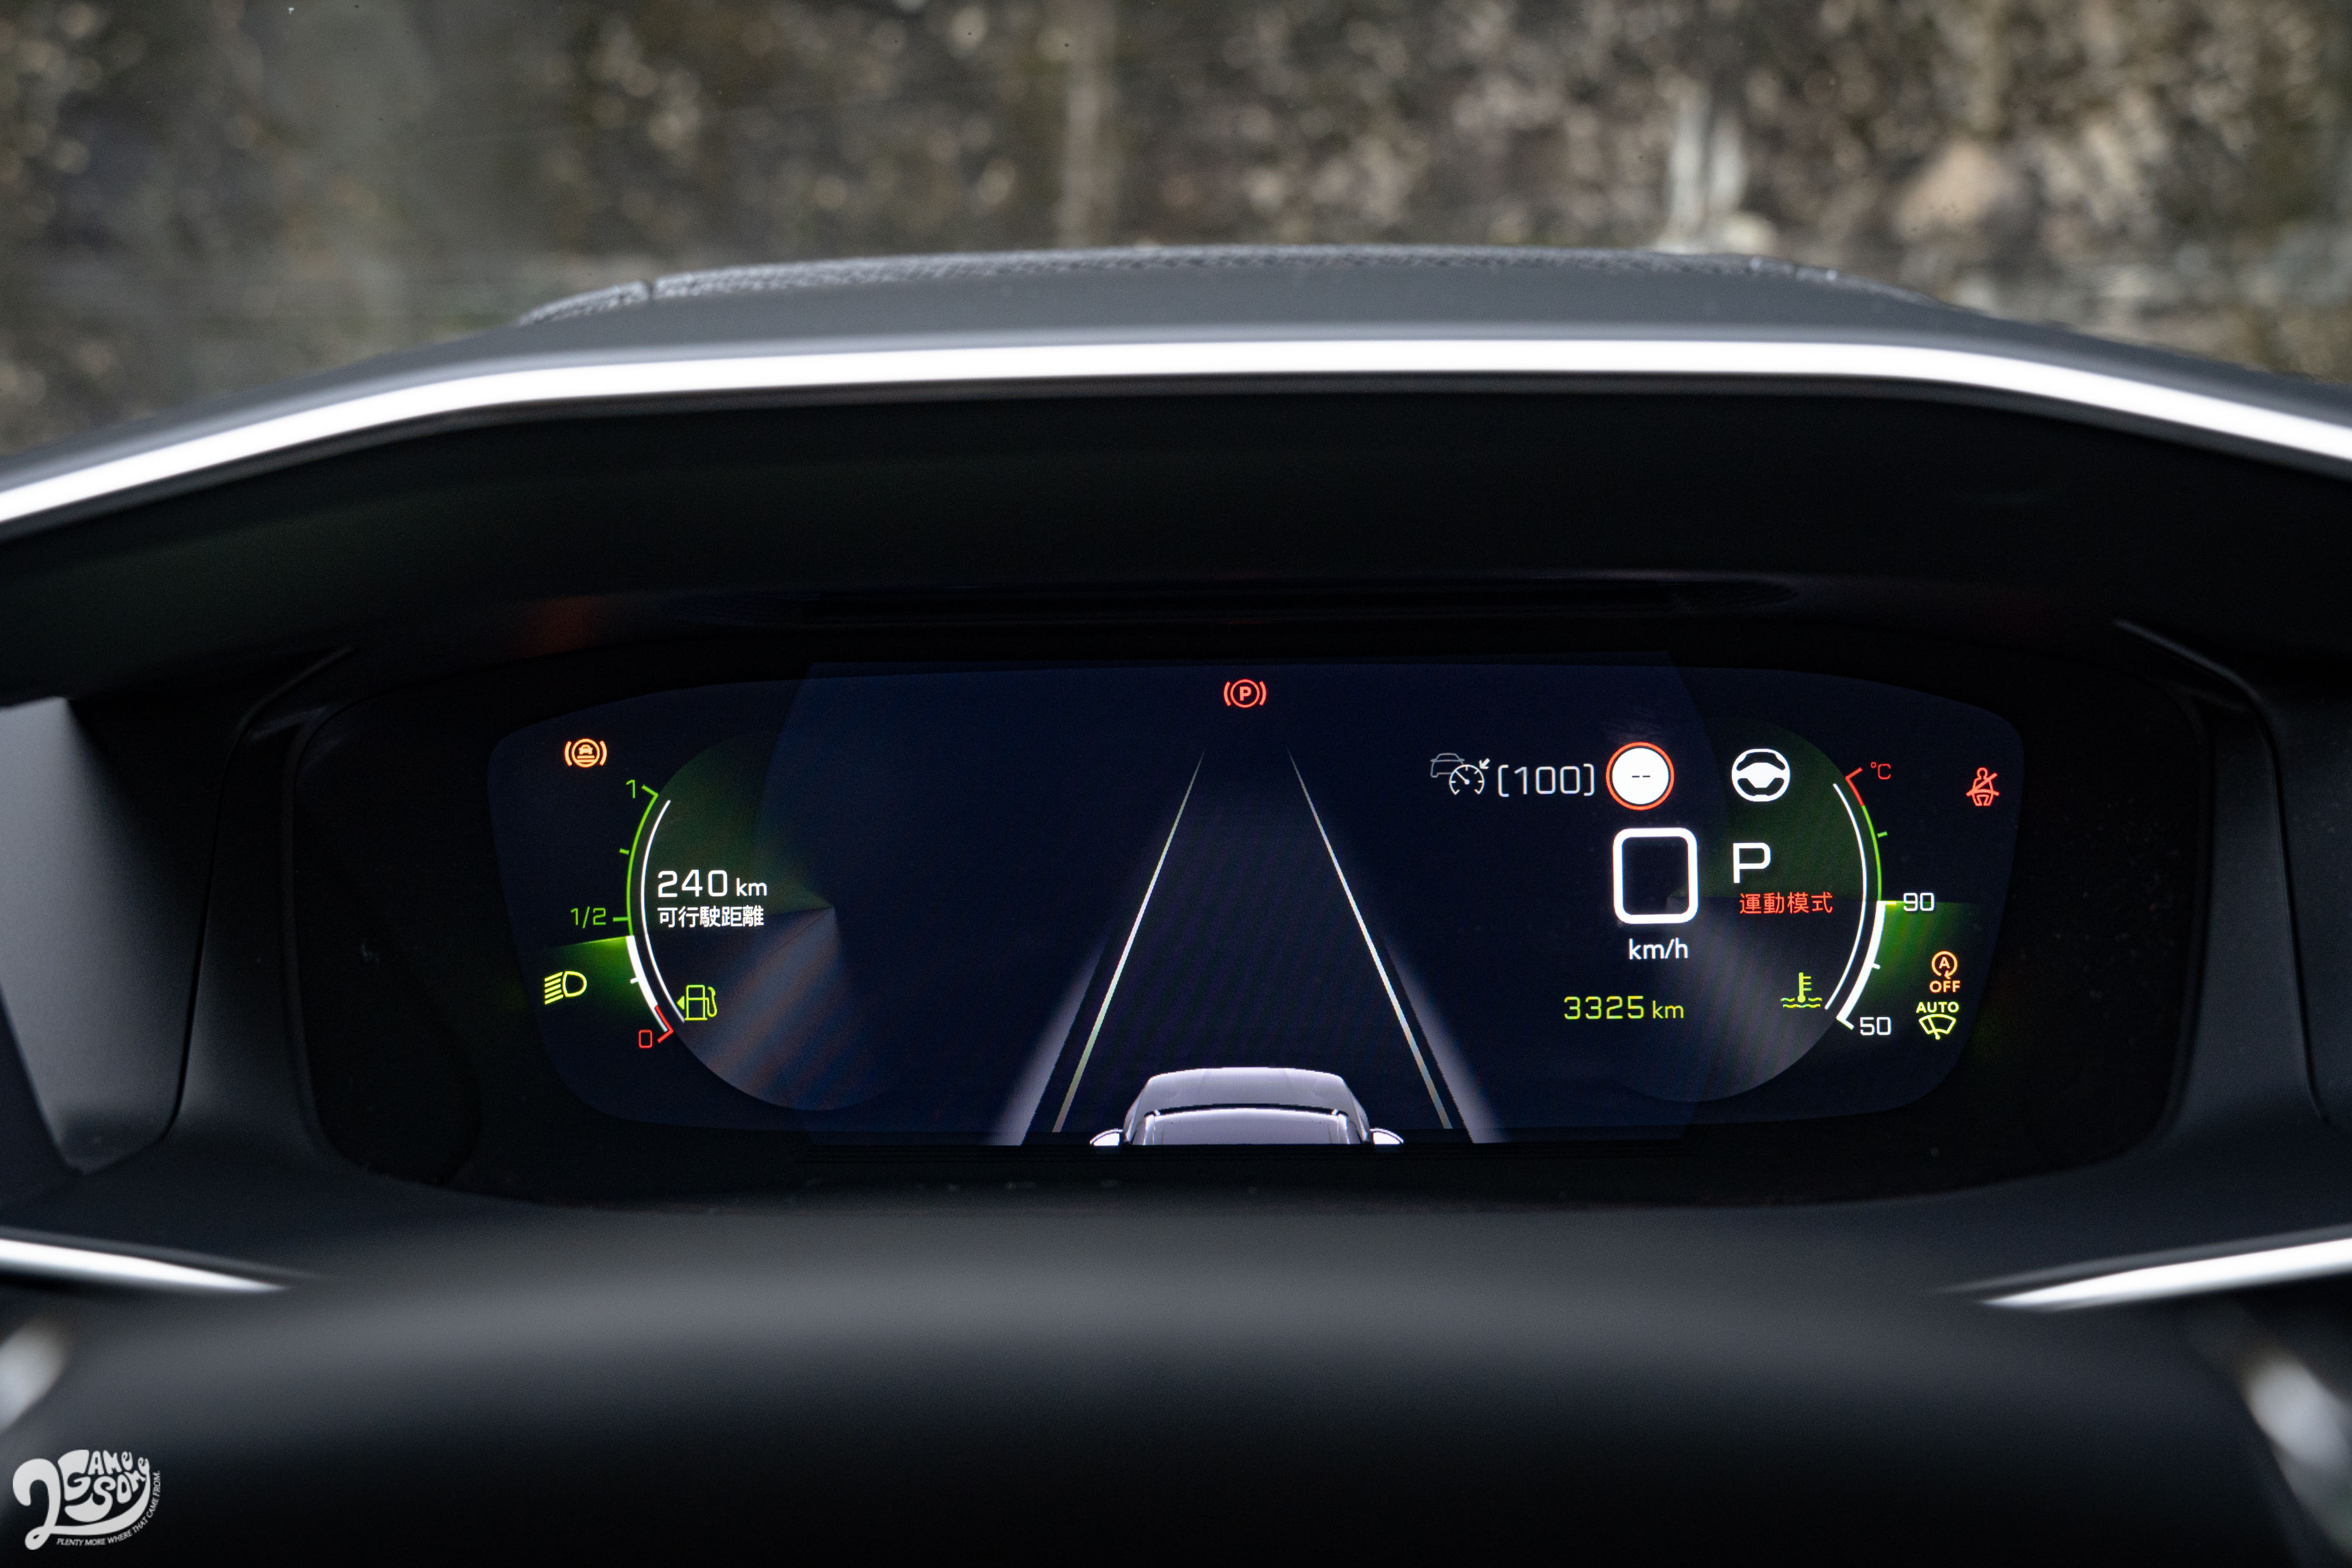 QUARTZ 3D 立體投影式抬頭顯示儀錶板,提供 3 種螢幕主題配色風格。